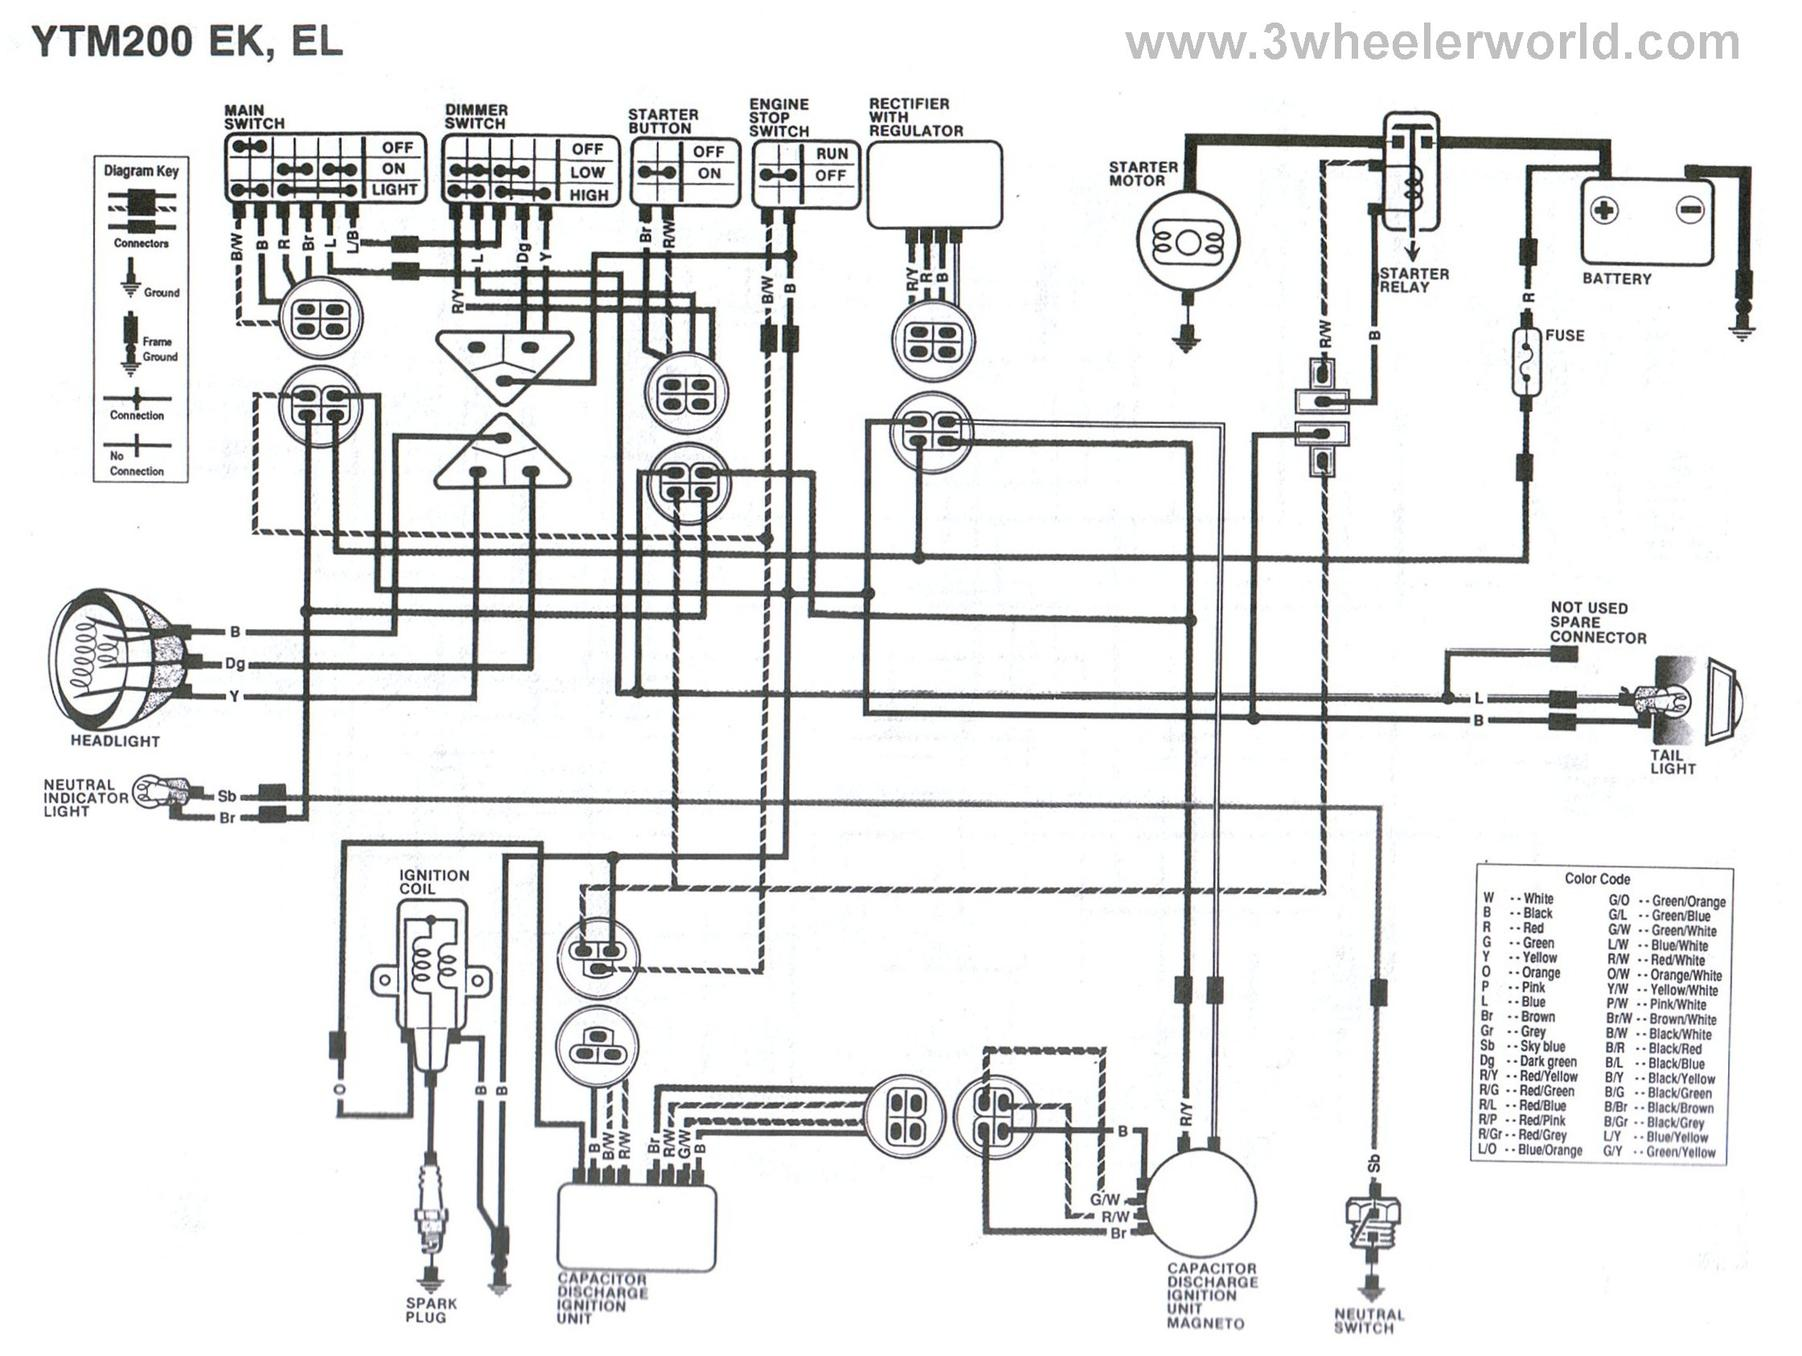 95 Yamaha Kodiak 400 4x4 Wiring Diagram likewise T1840397 Wiring diagram electric start dtr 125 together with Yamaha Rhino 660 Timing Marks besides 1985 1995 Yamaha Moto 4 200225250350 Service Manual Download as well Polaris 1995 300 Wiring Diagrams. on wiring diagram 1987 yamaha warrior 350